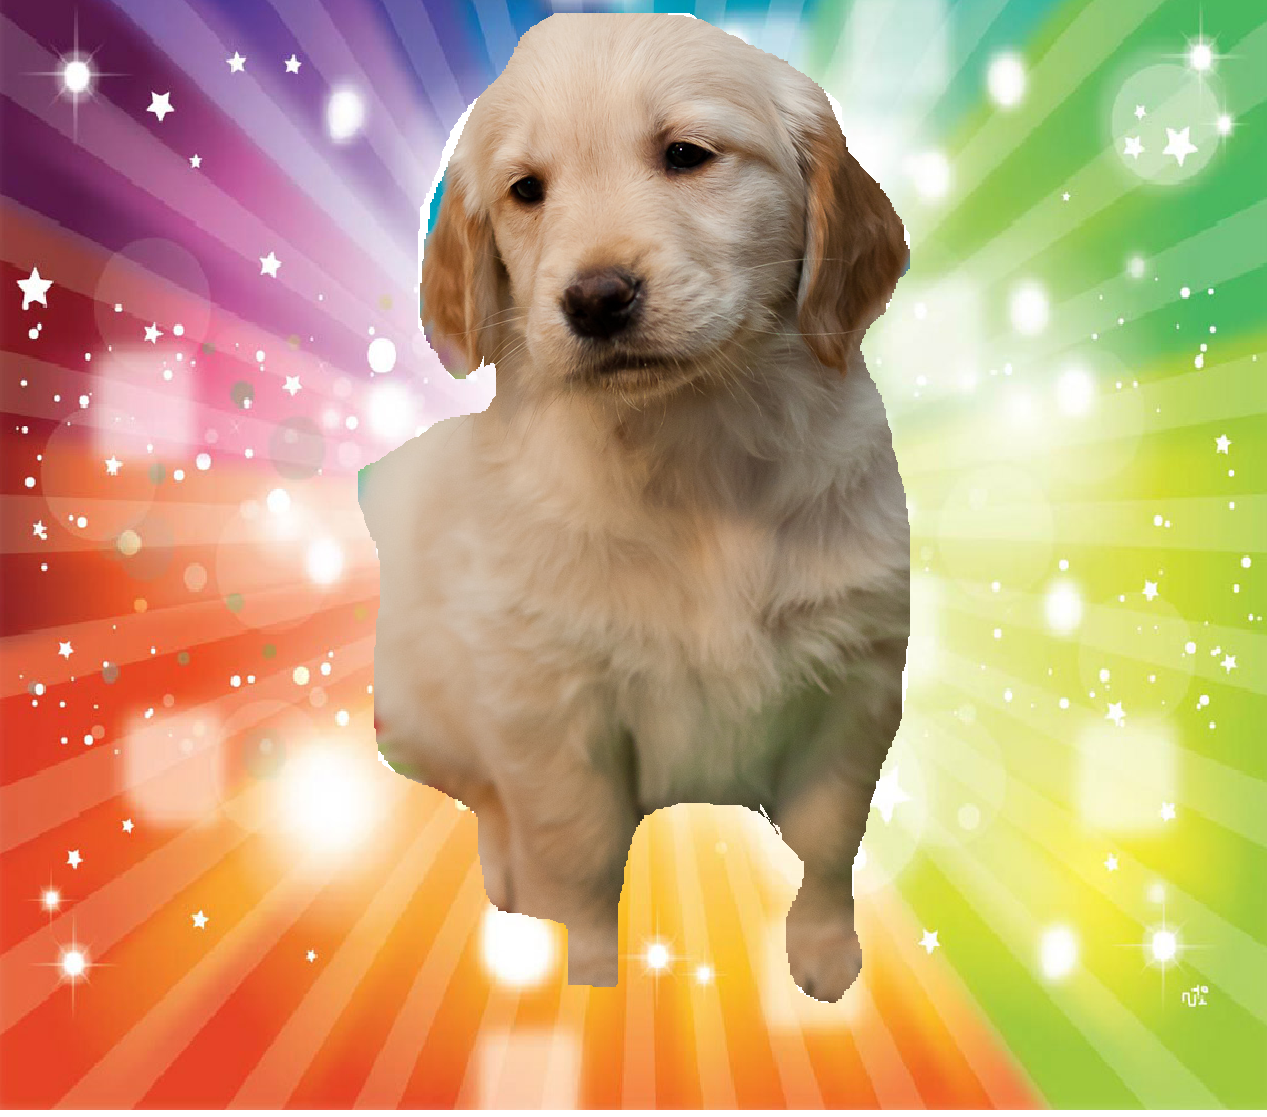 Pin By Strawberryposh On Puppy Love